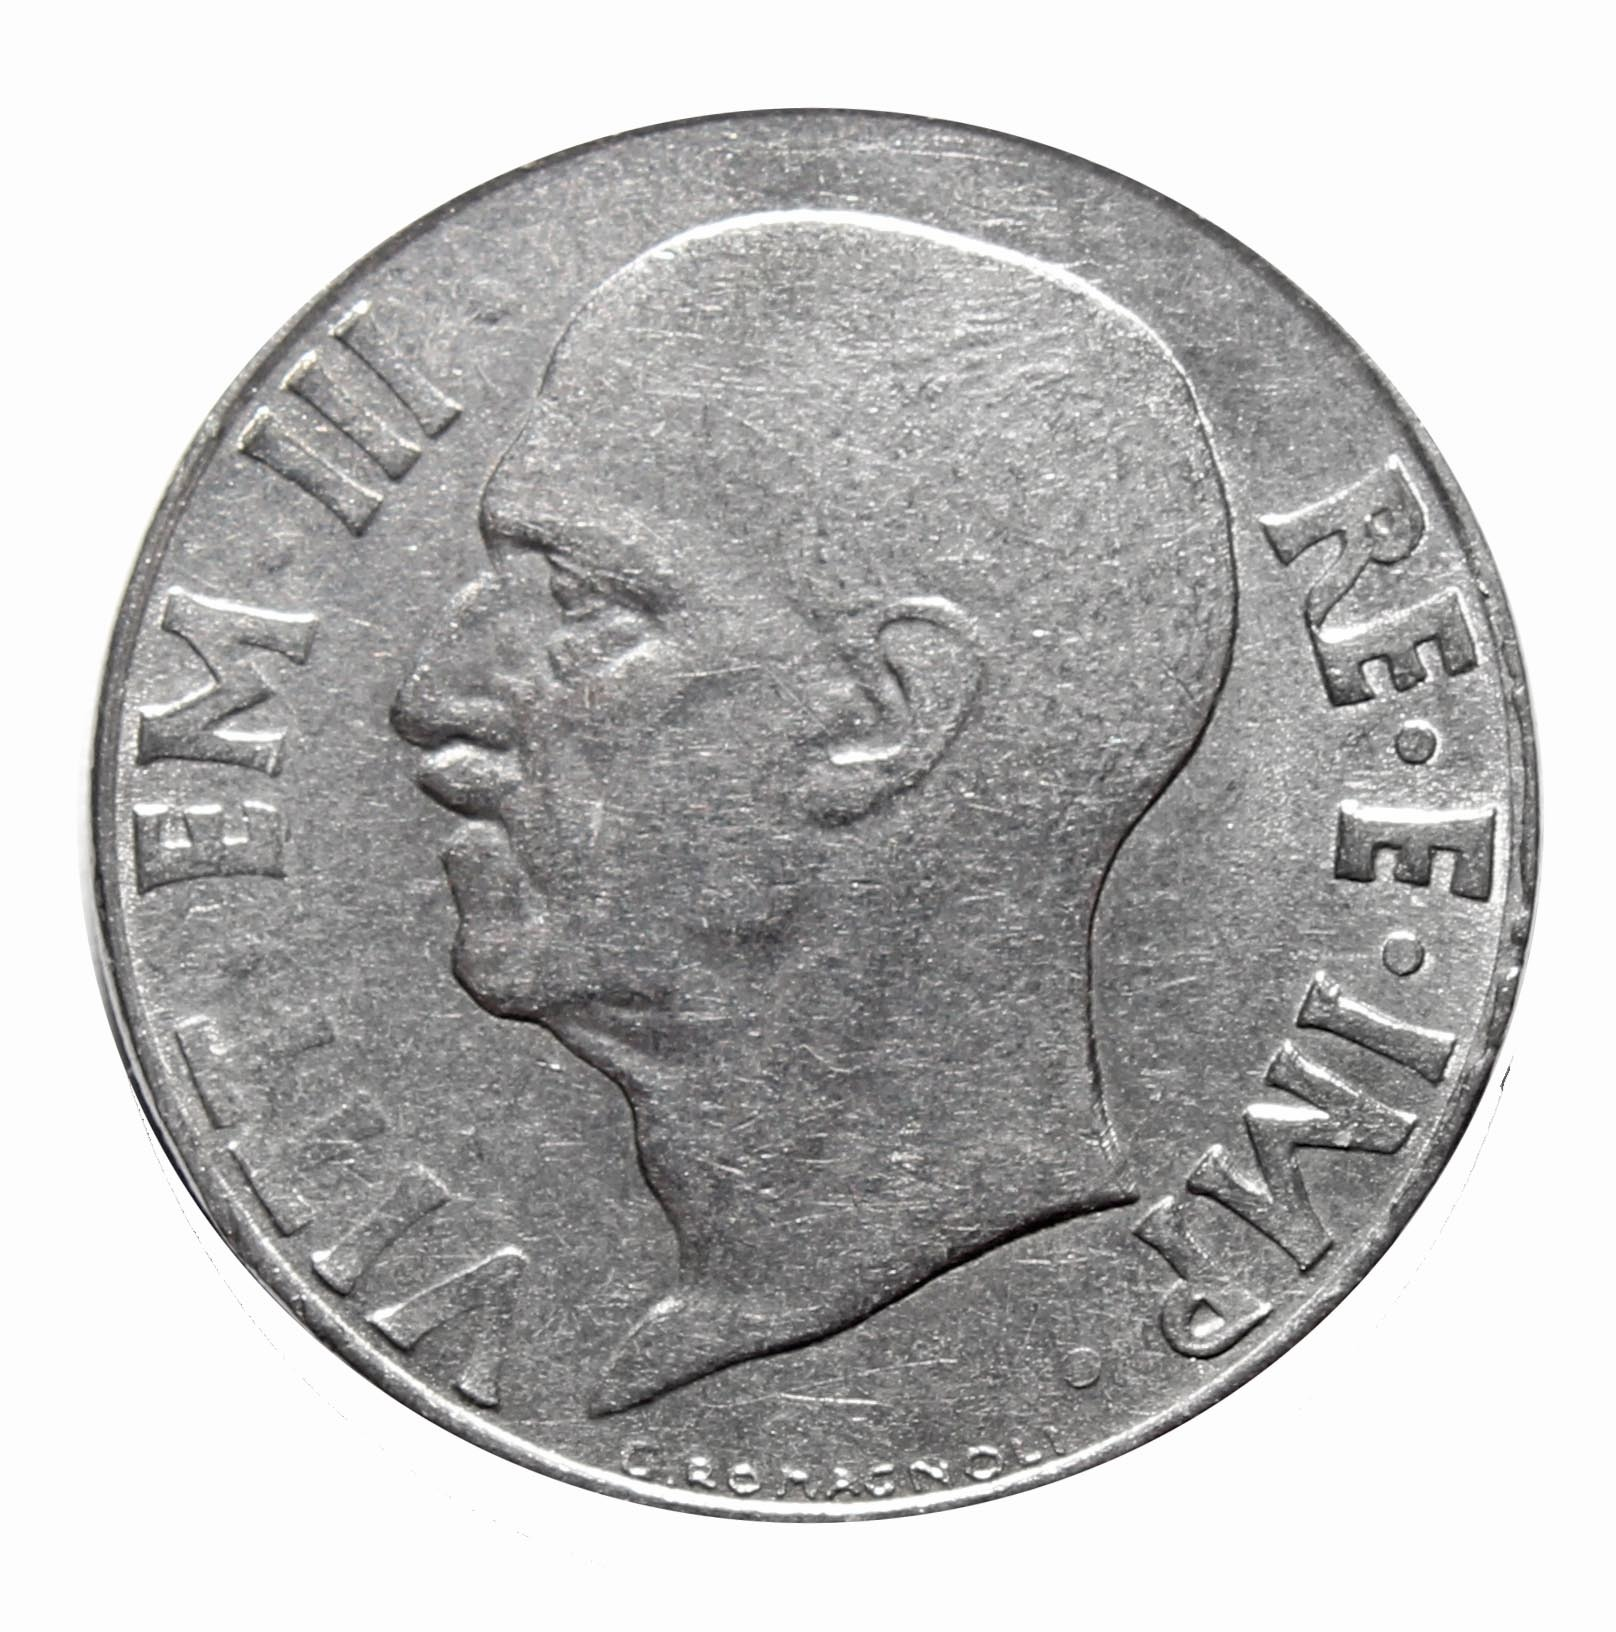 20 чентезимо. Италия. 1940-1942 гг. XF